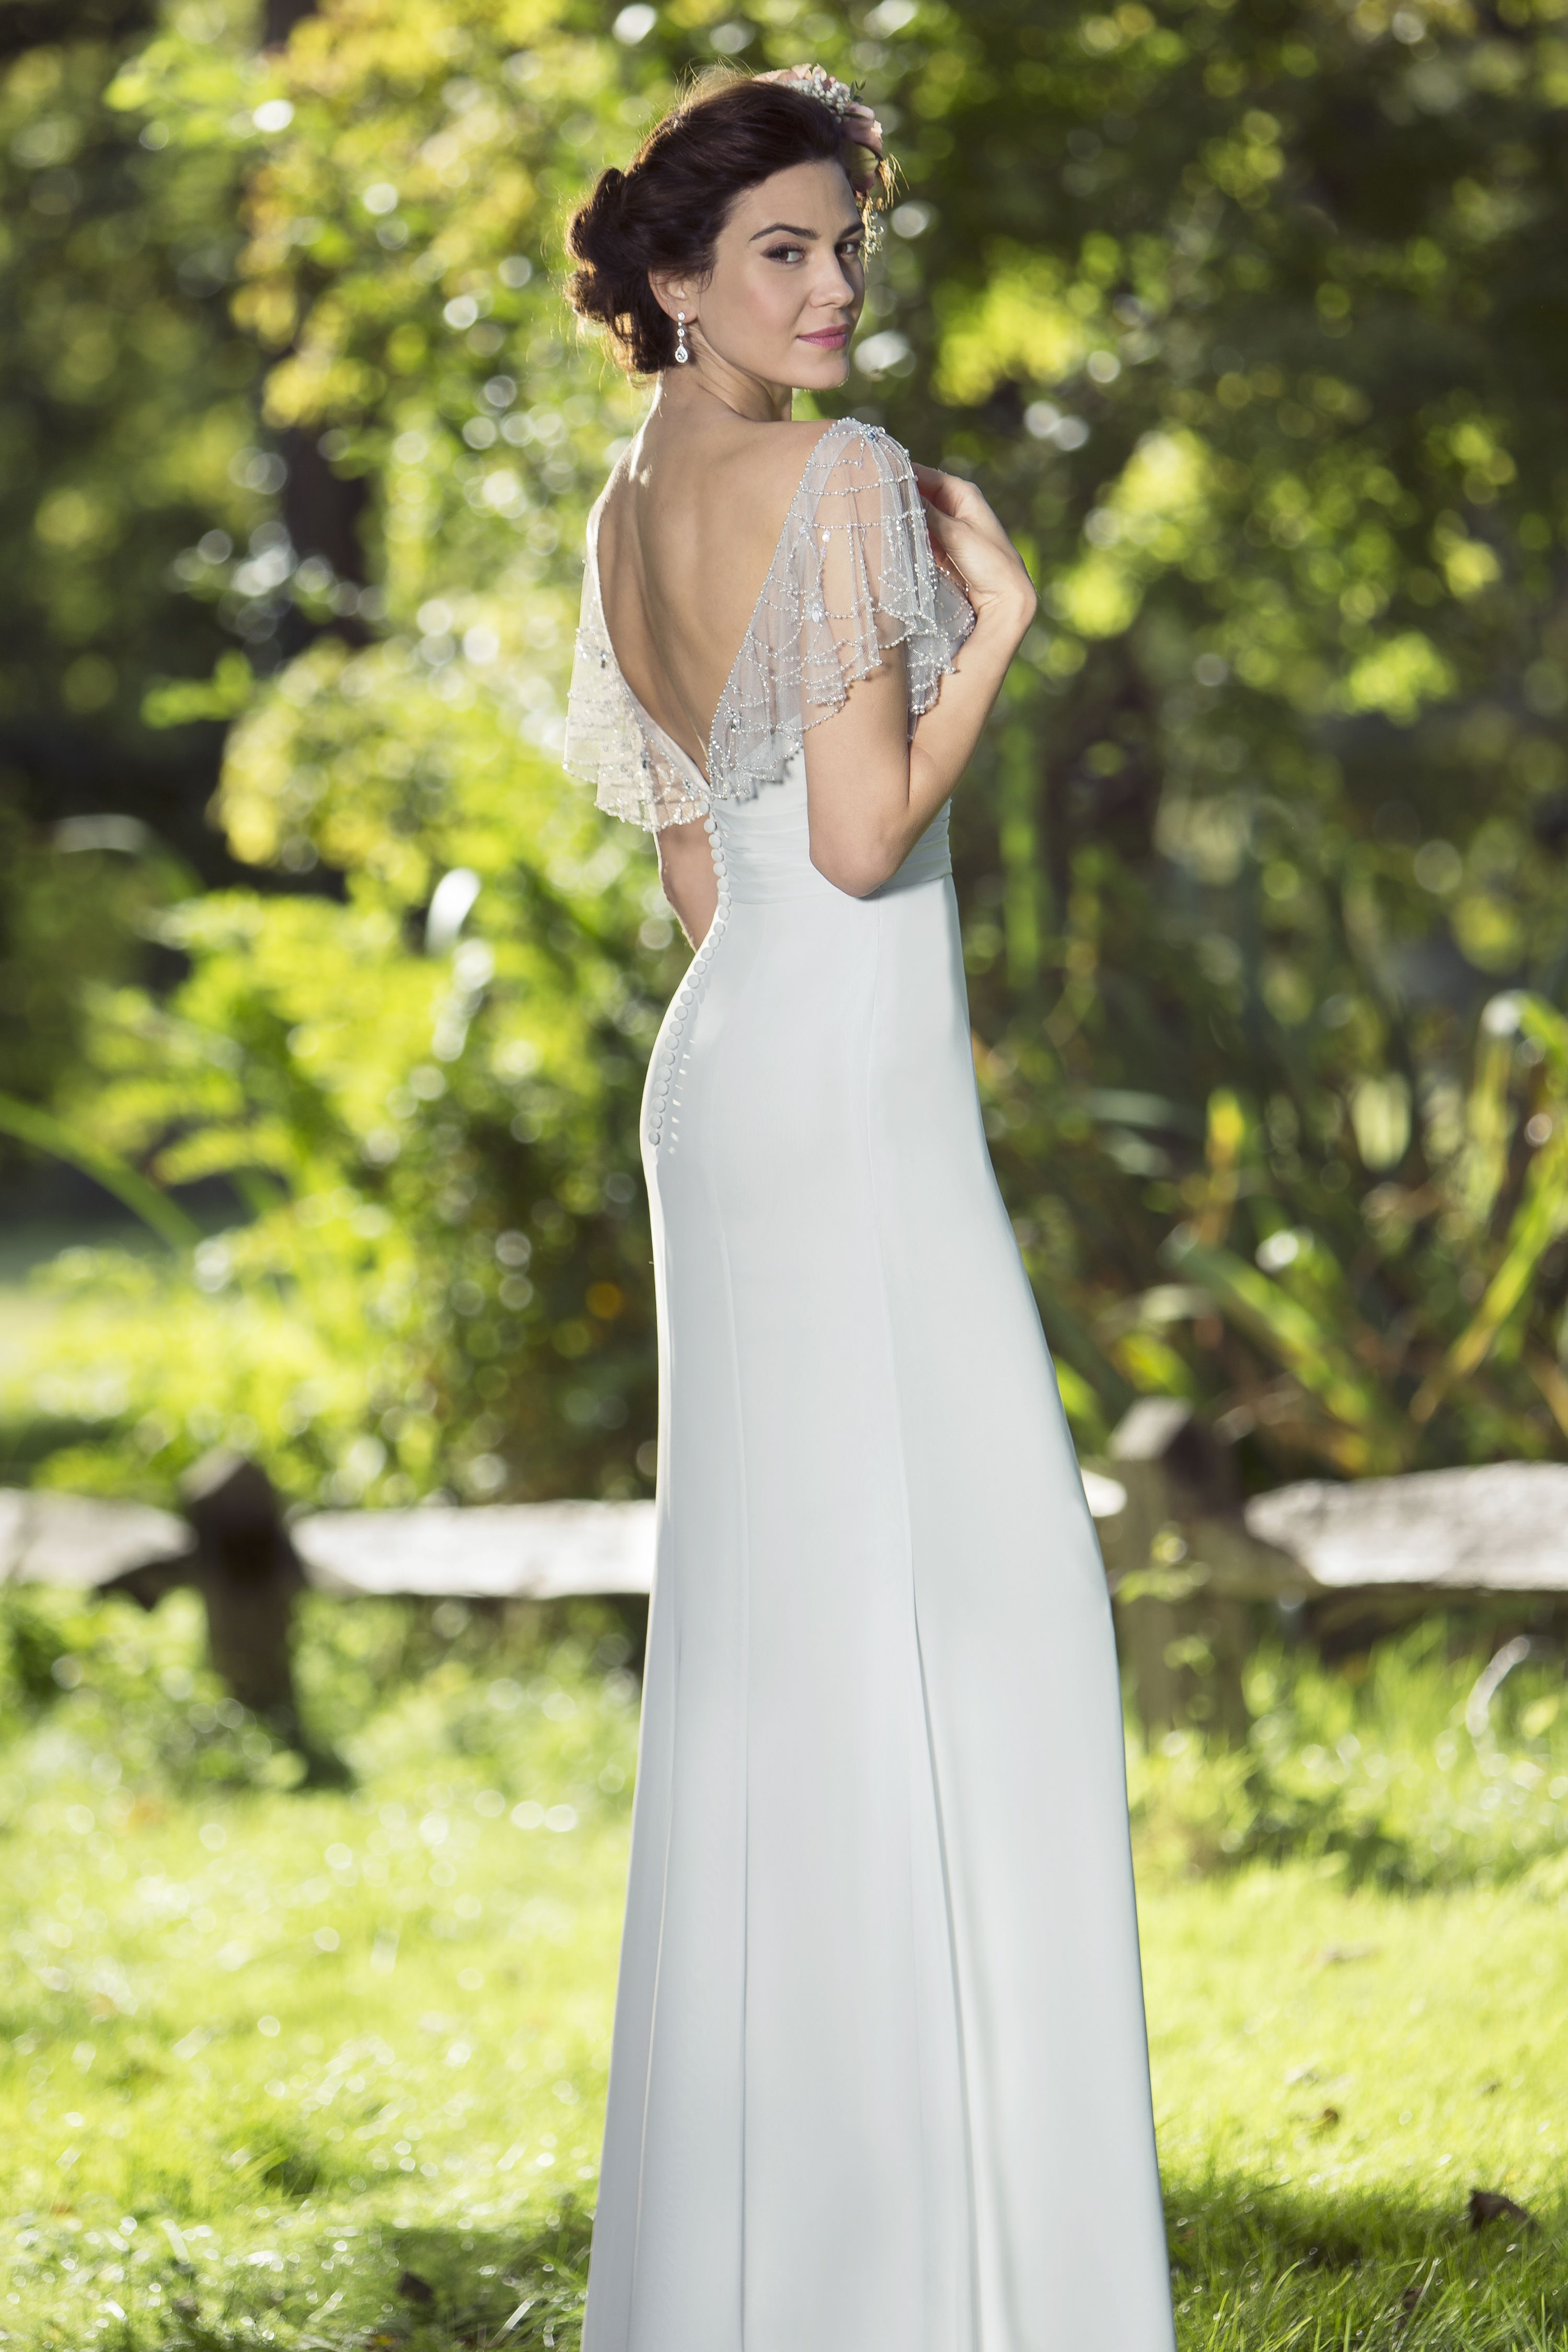 Bridesmaid Dress By True Bride M678 Gatsby Bridesmaiddress